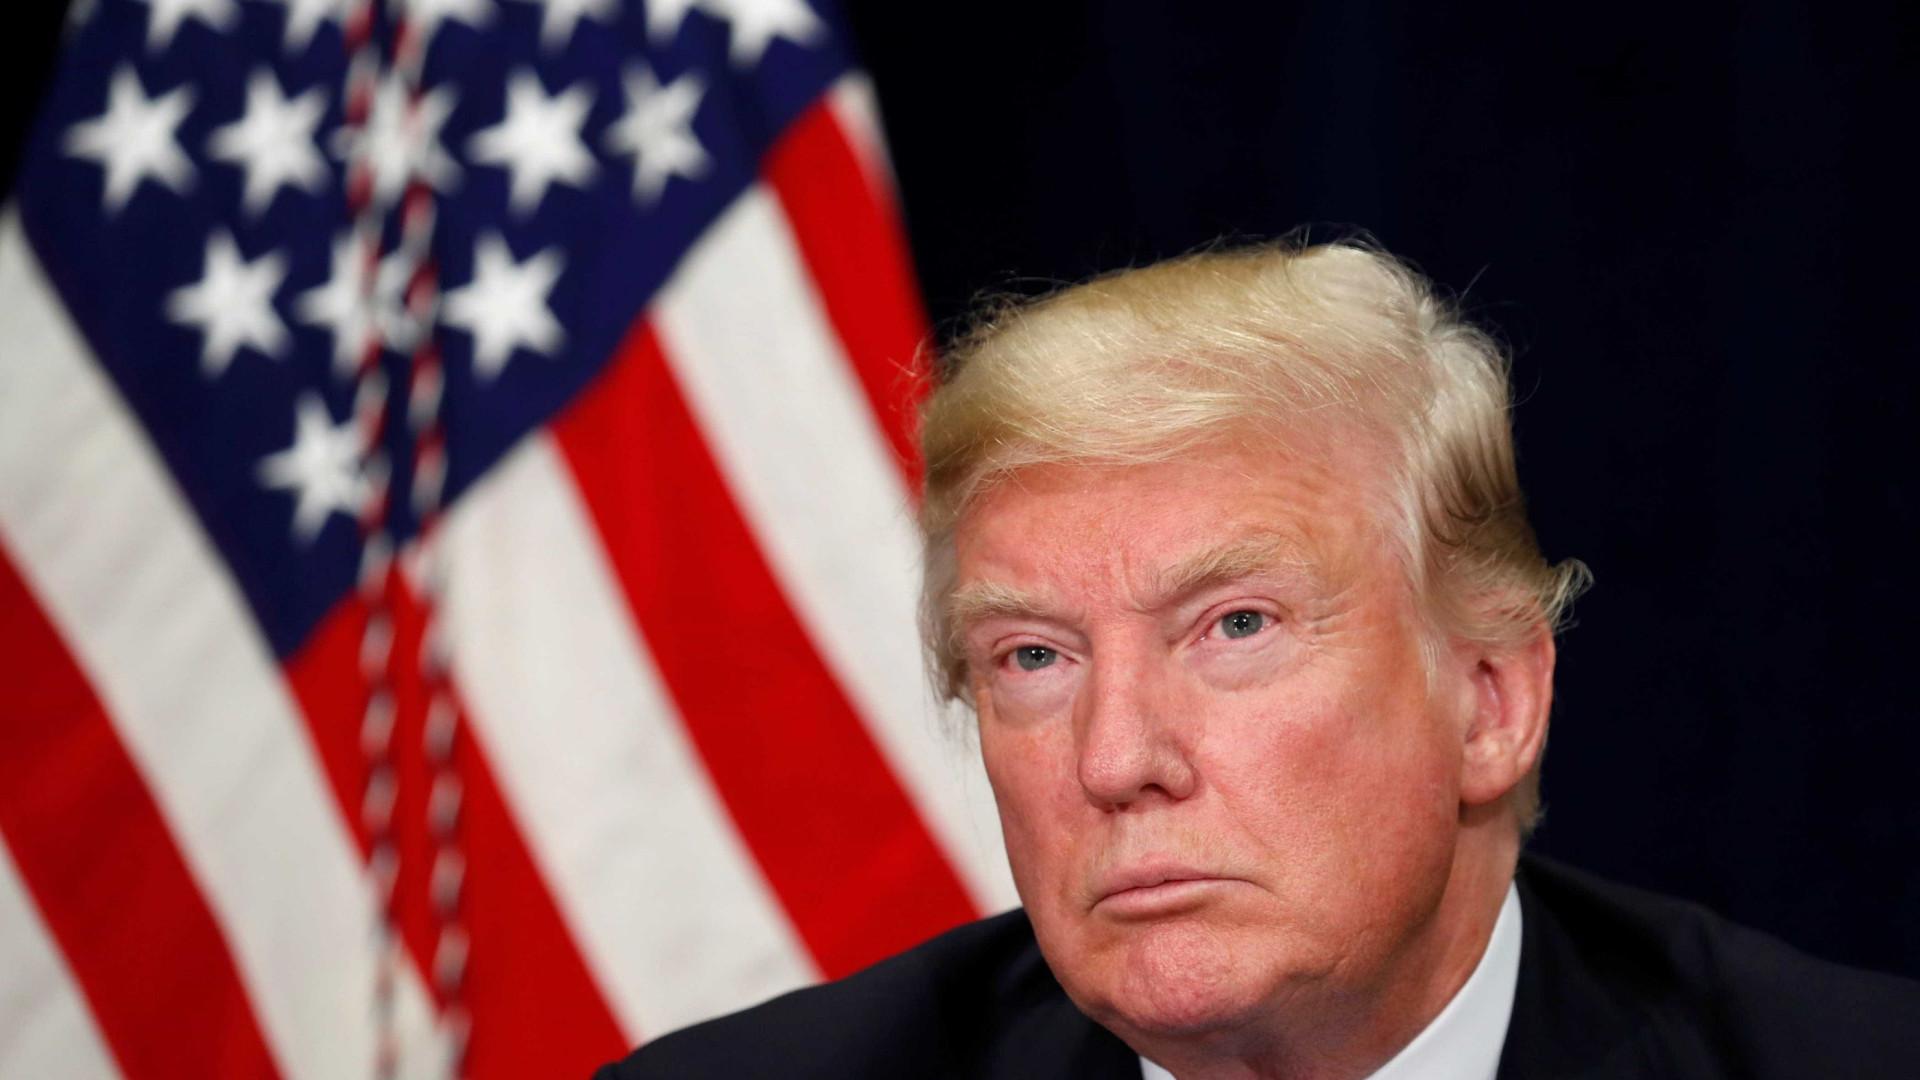 Juiz bloqueia decreto de Trump para limitar pedidos de asilo